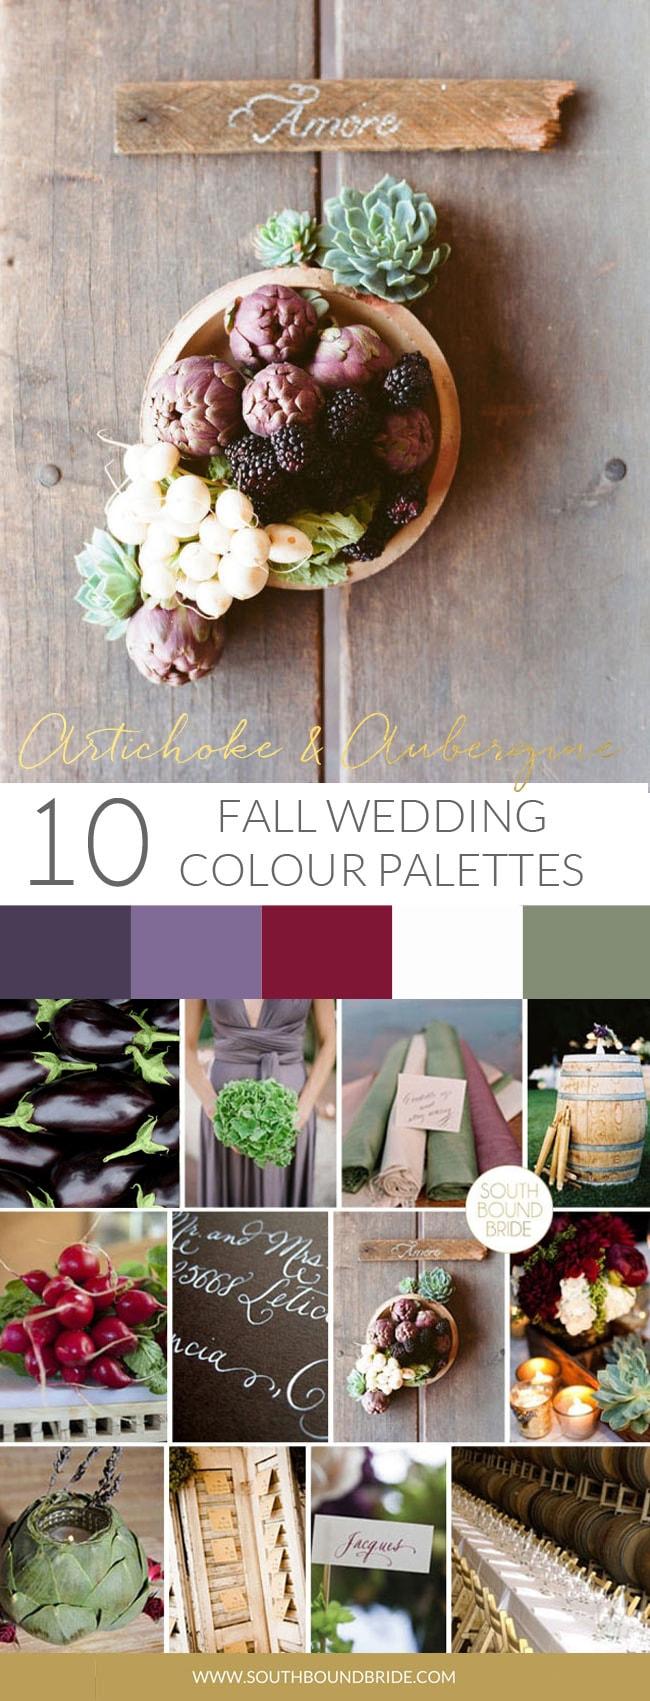 Artichoke & Aubergine Fall Wedding Palette | SouthBound Bride